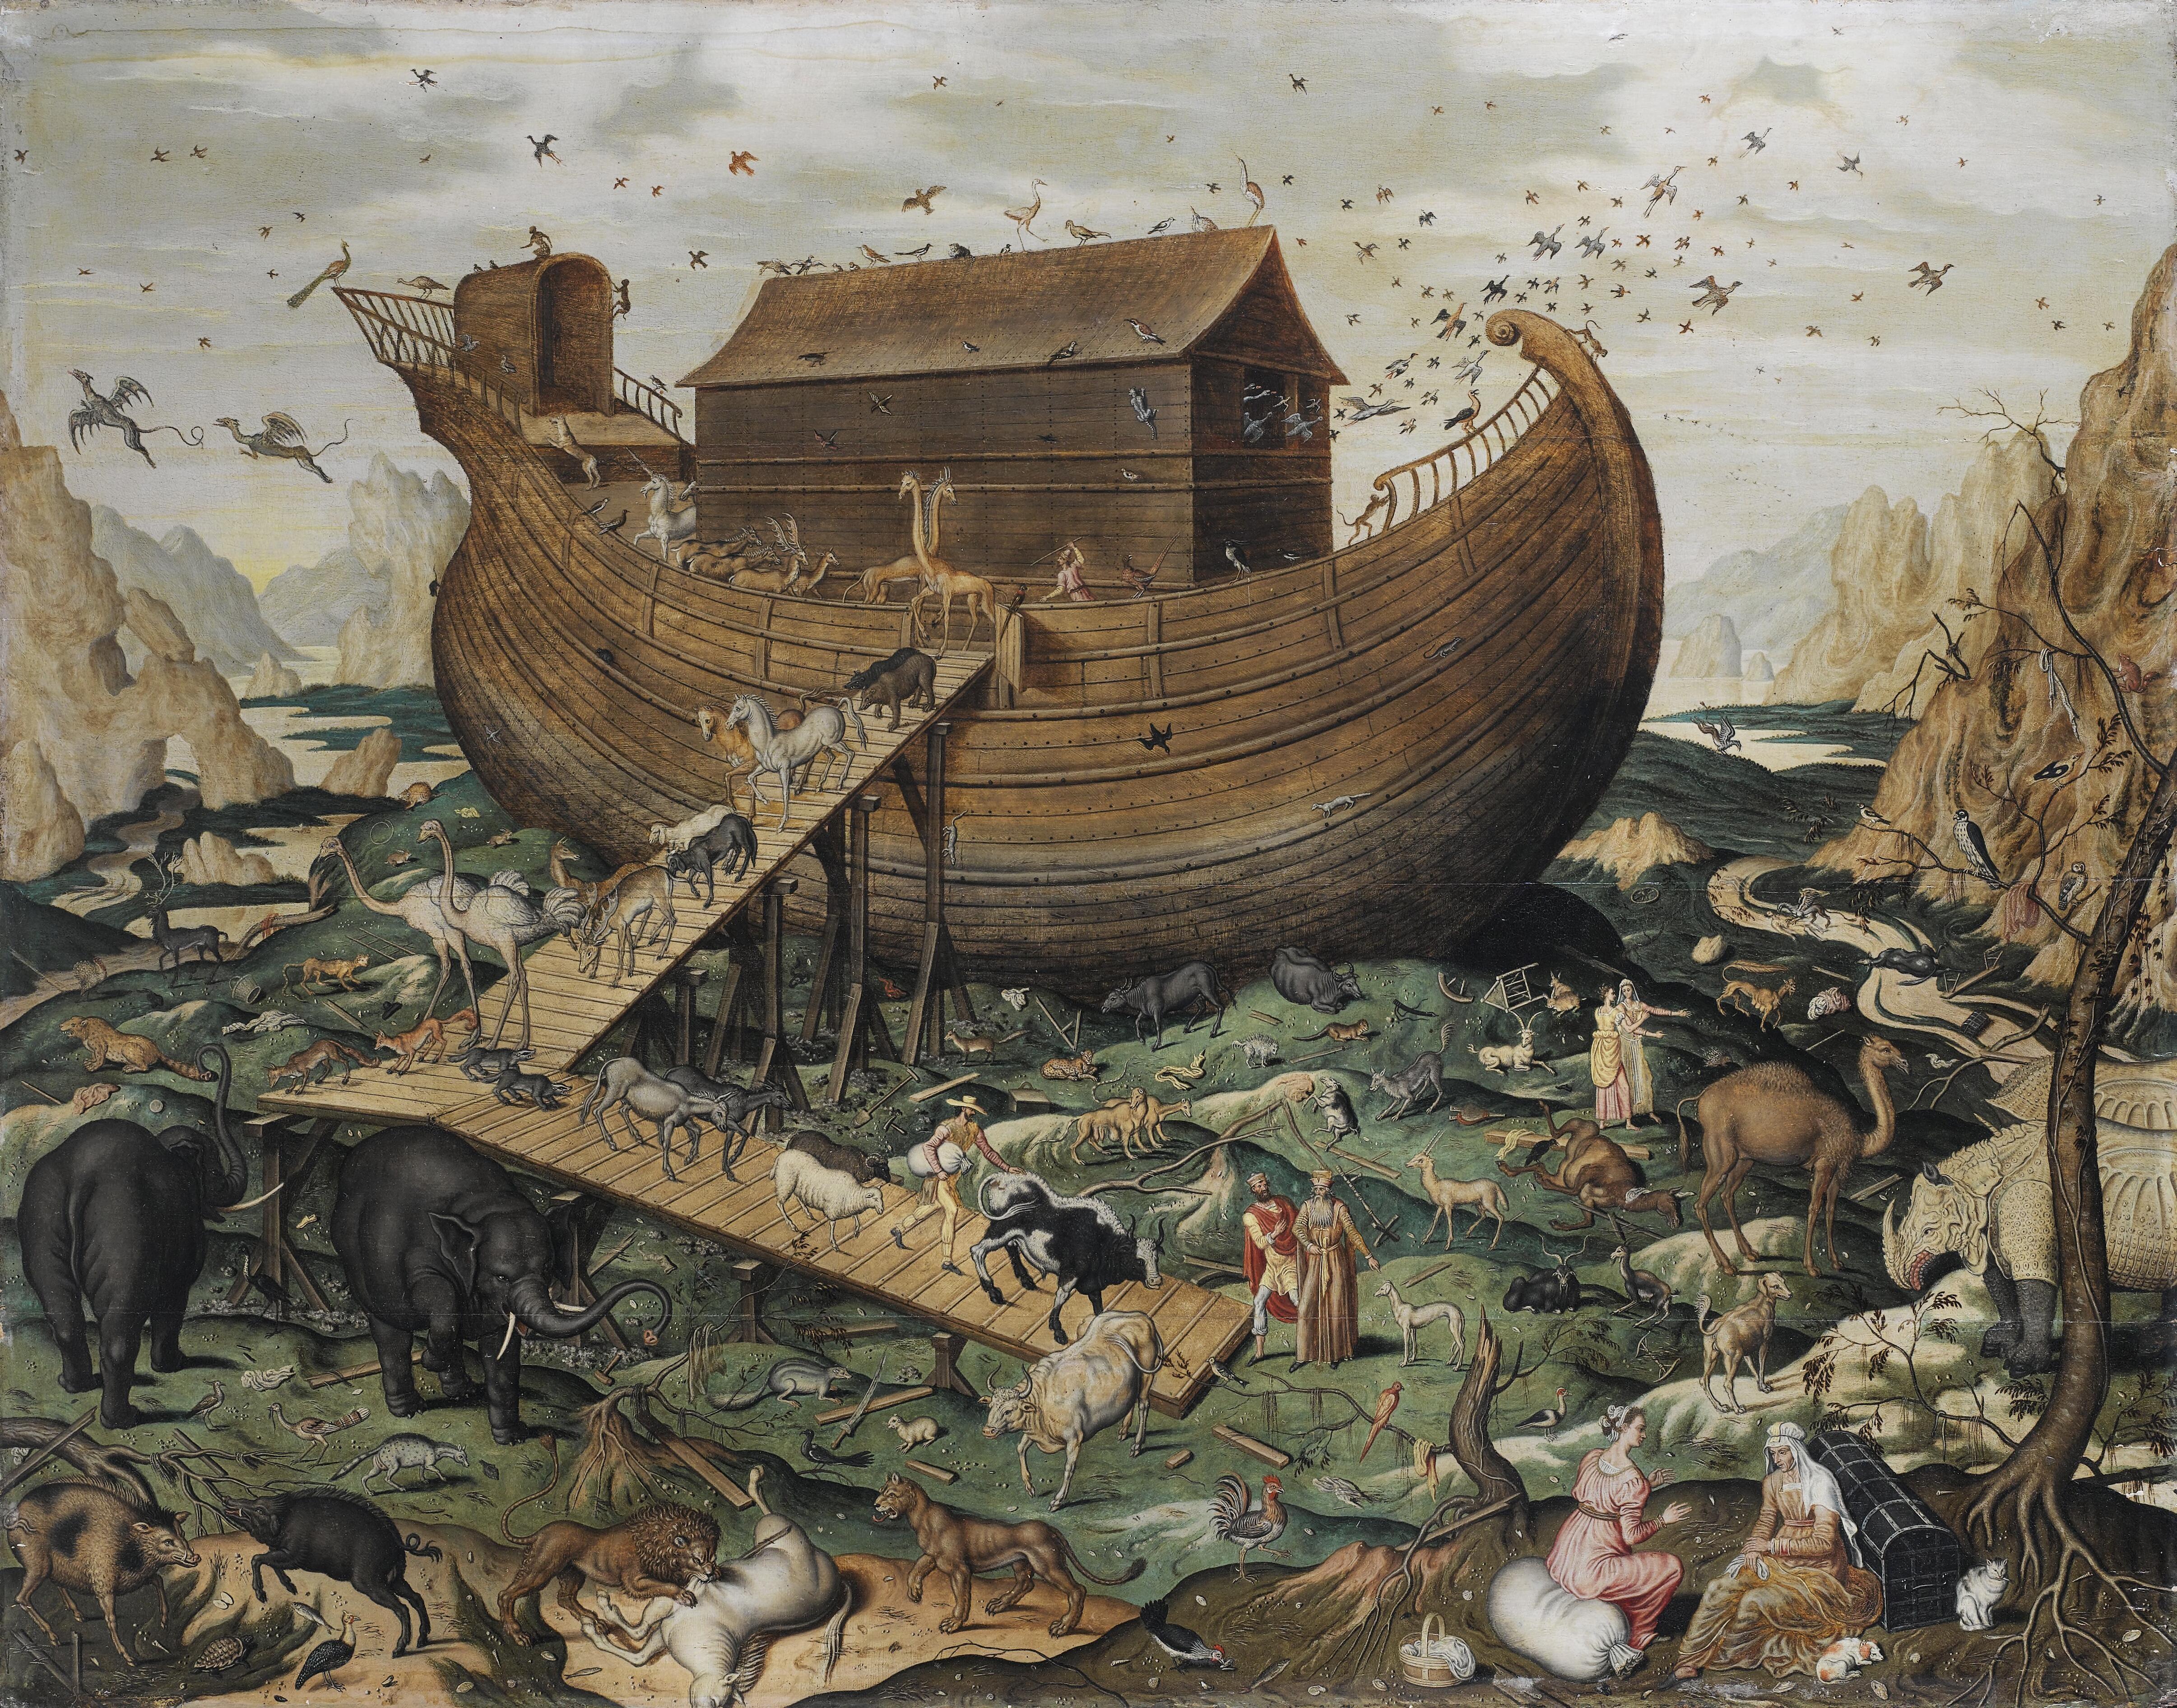 File:Noah's Ark on Mount Ararat by Simon de Myle.jpg - Wikimedia ...